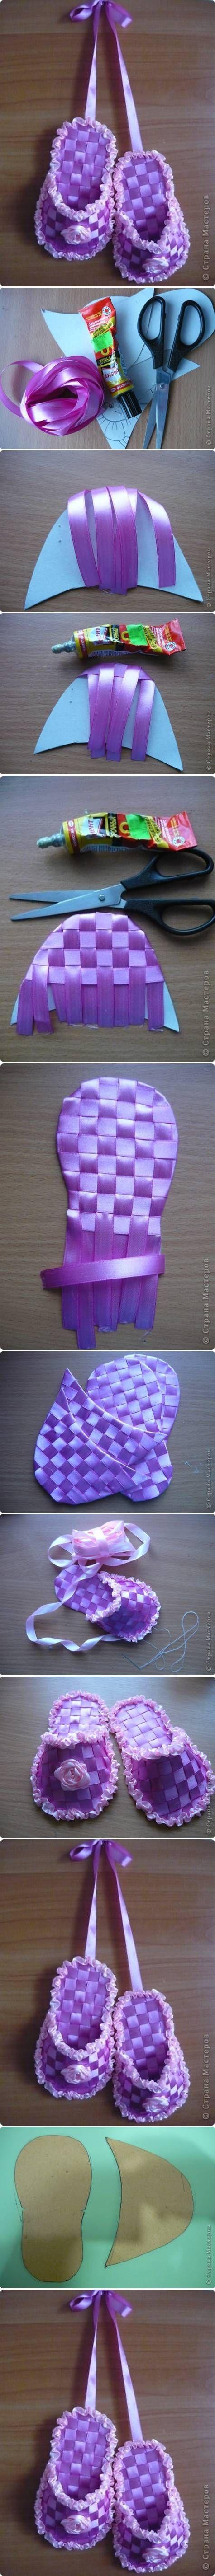 DIY Gift Ribbon Slippers DIY Projects | UsefulDIY.com Follow Us on Facebook ==> http://www.facebook.com/UsefulDiy